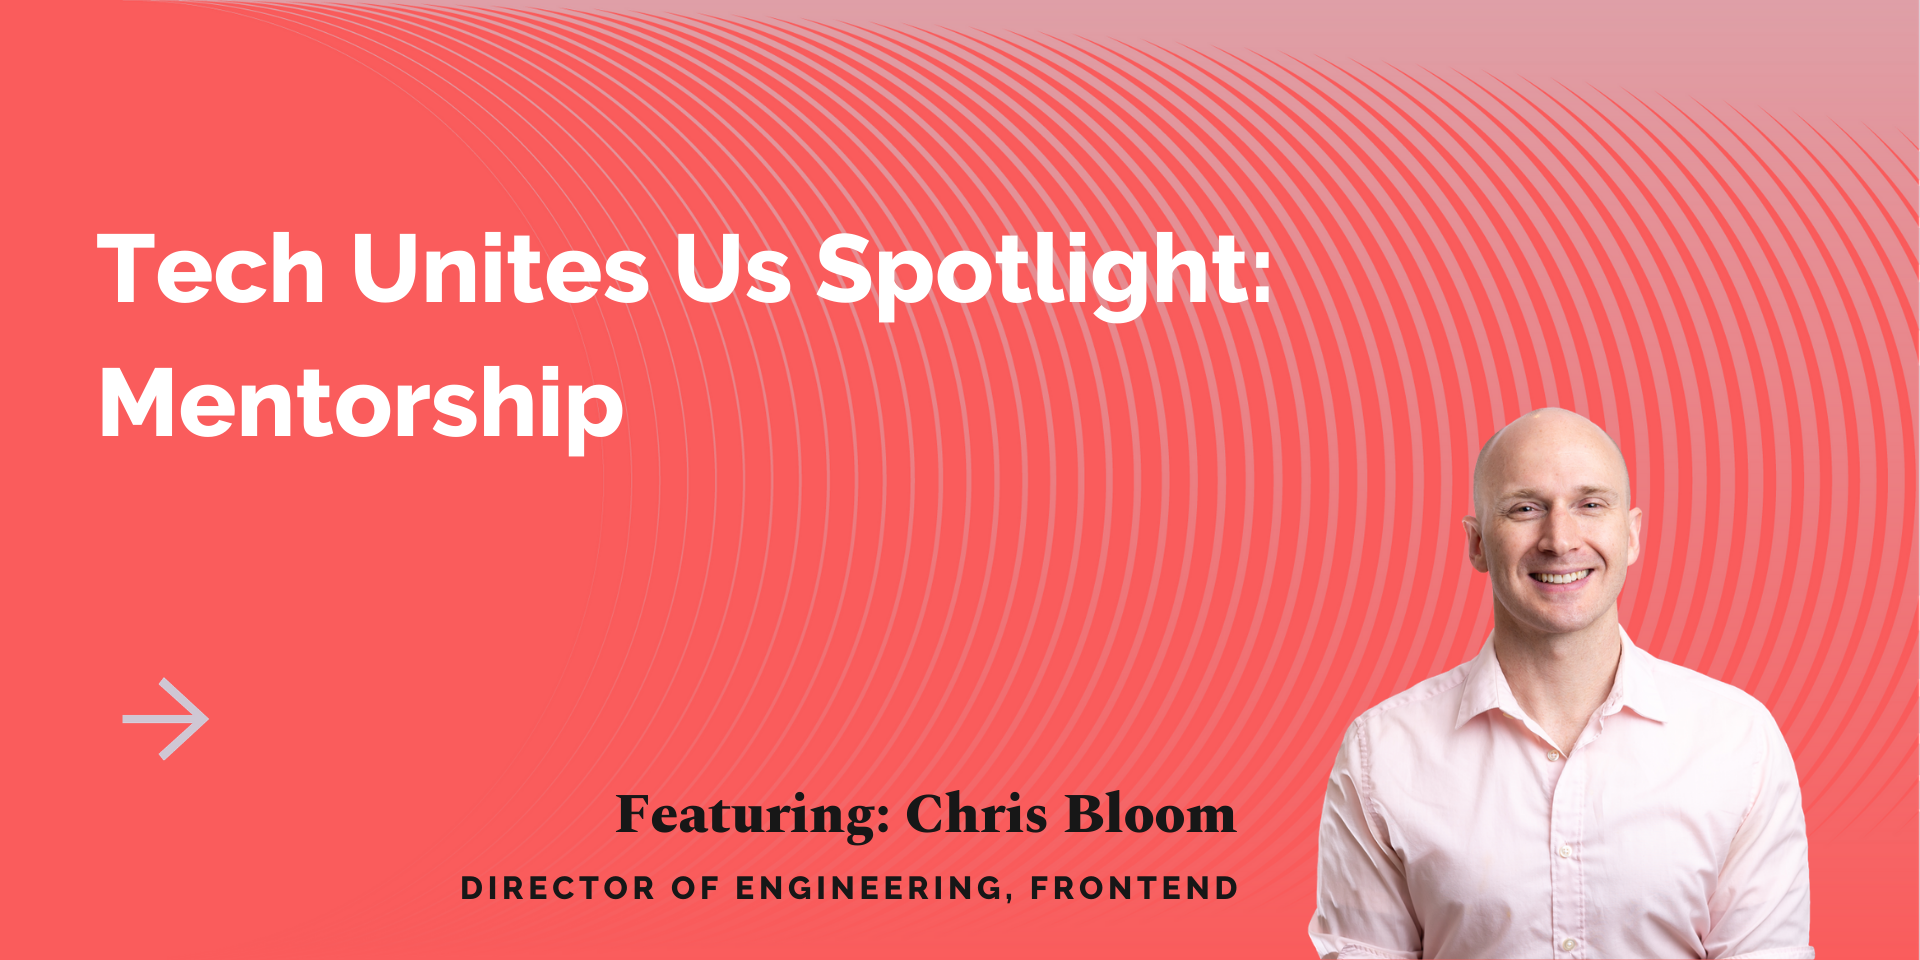 Tech Unites Us Spotlight - Mentorship